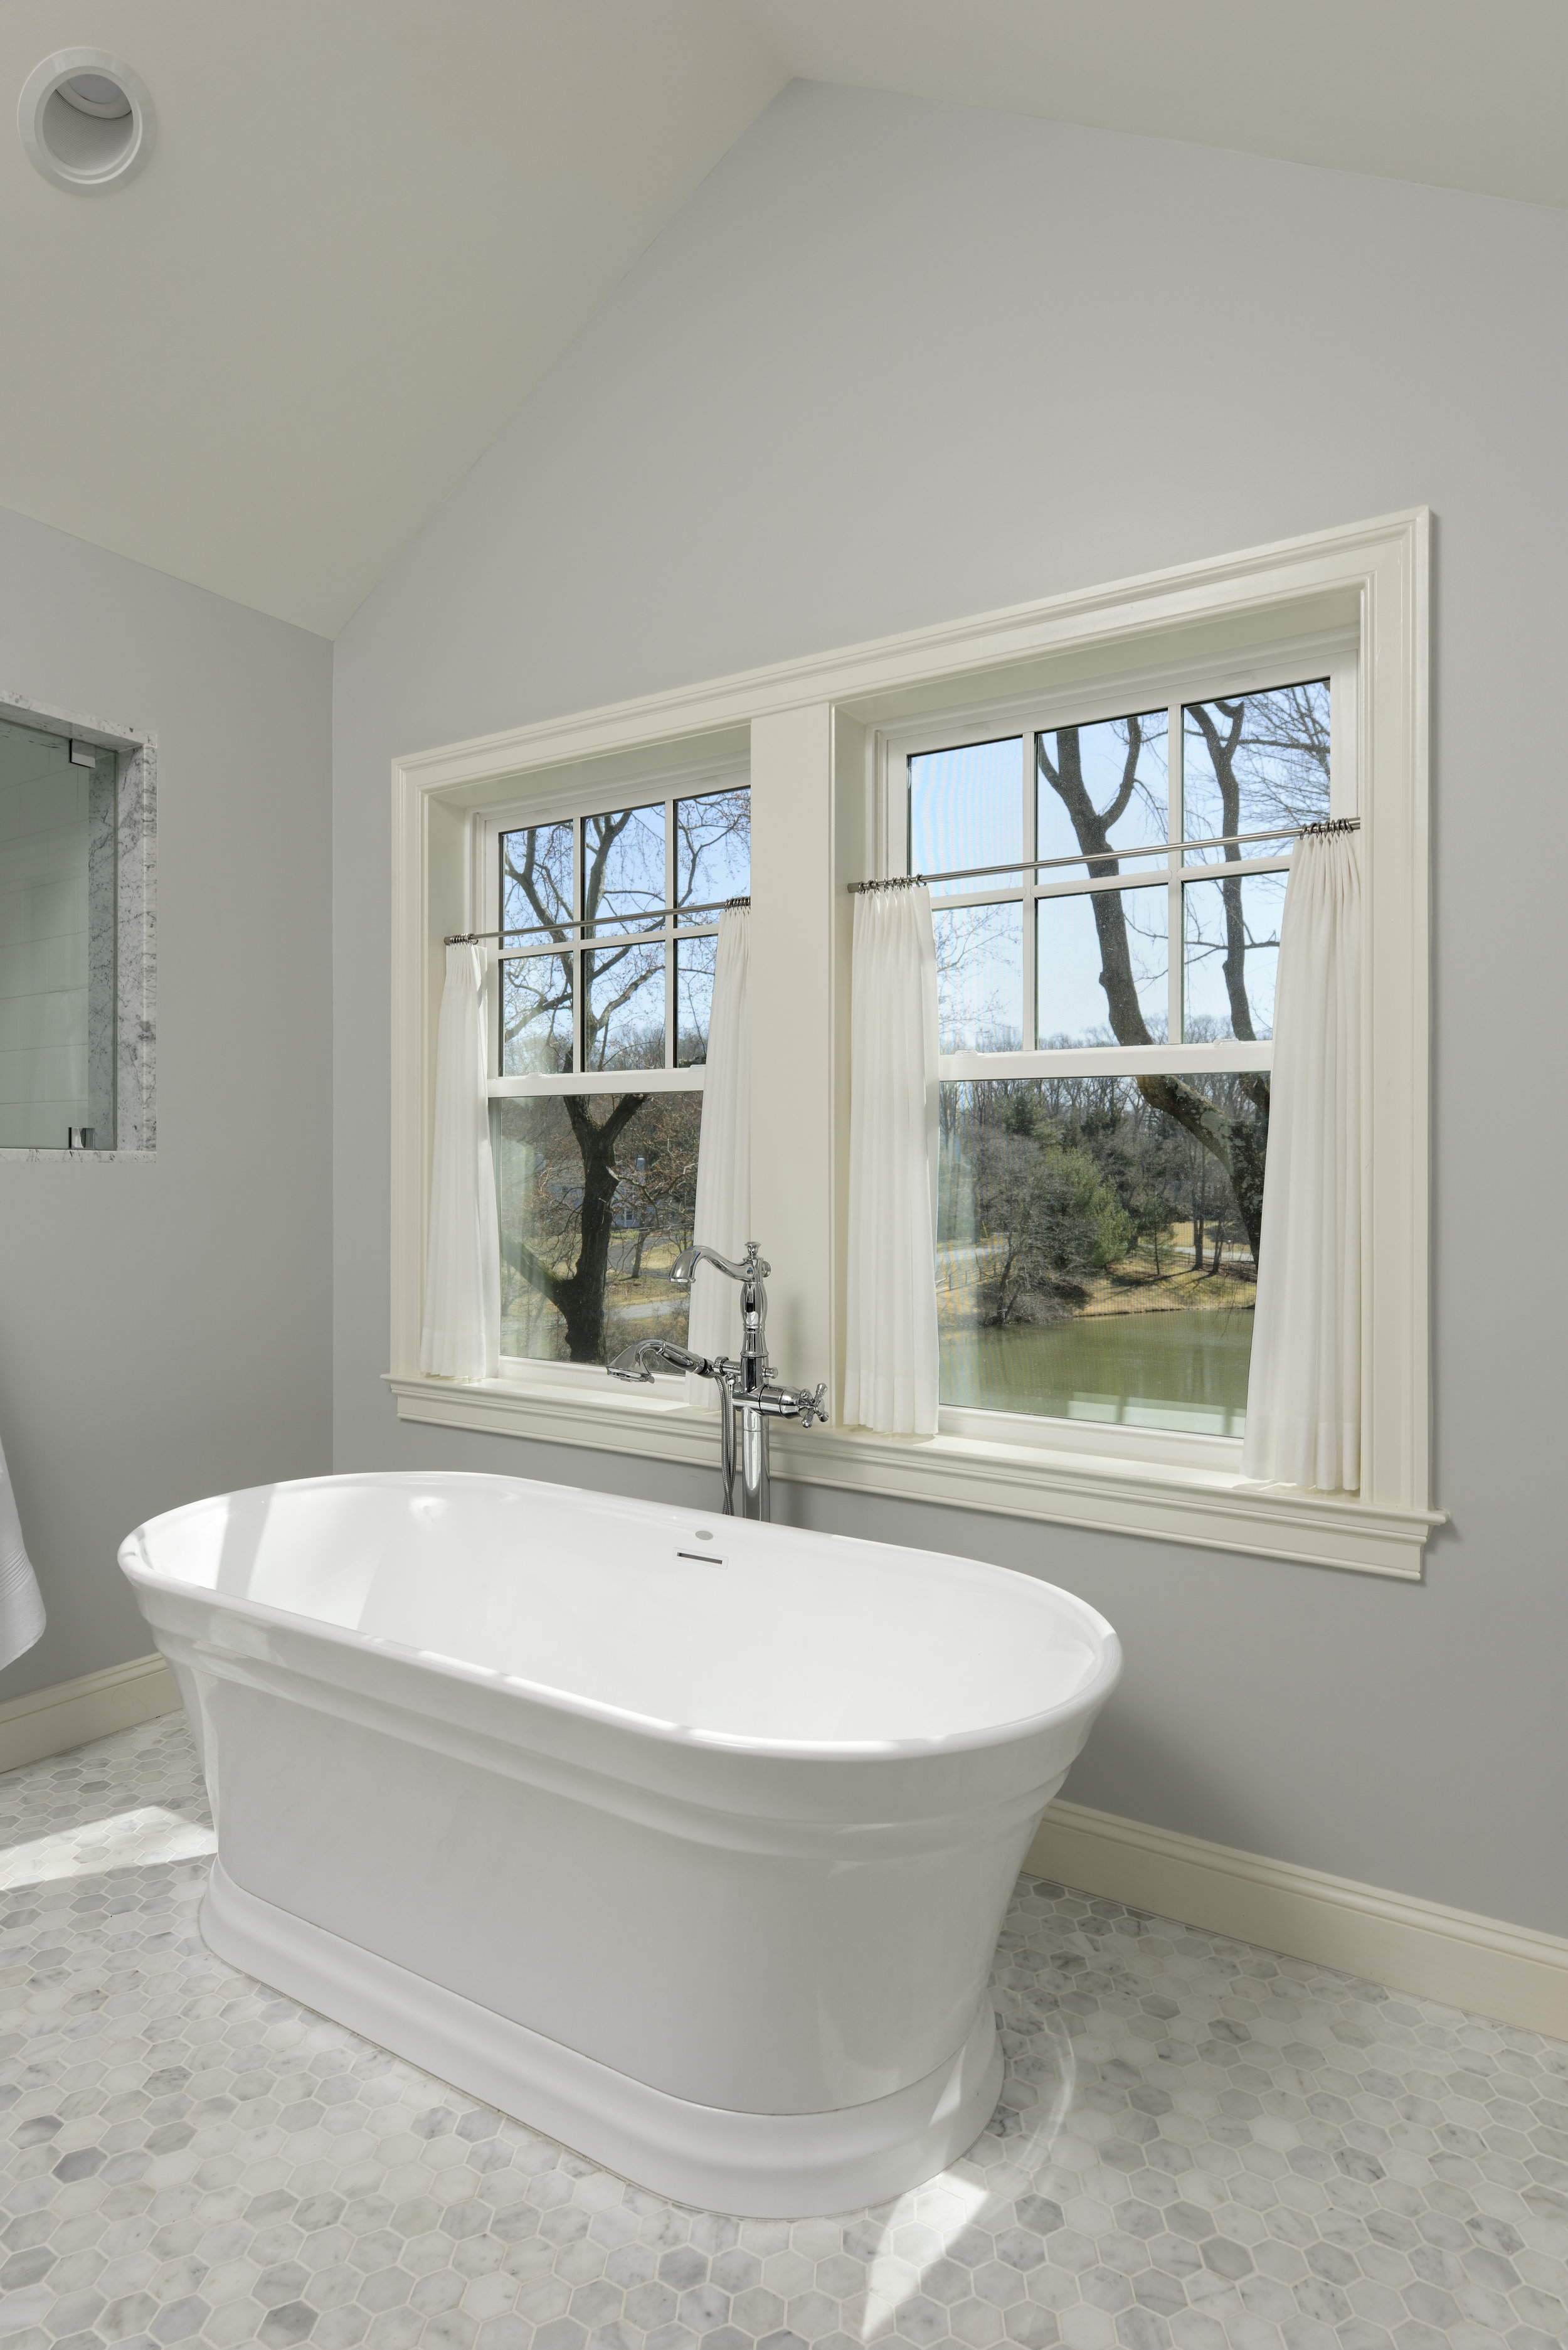 Meltzer High Res-Master Bathroom 4-D19045-5360.jpg